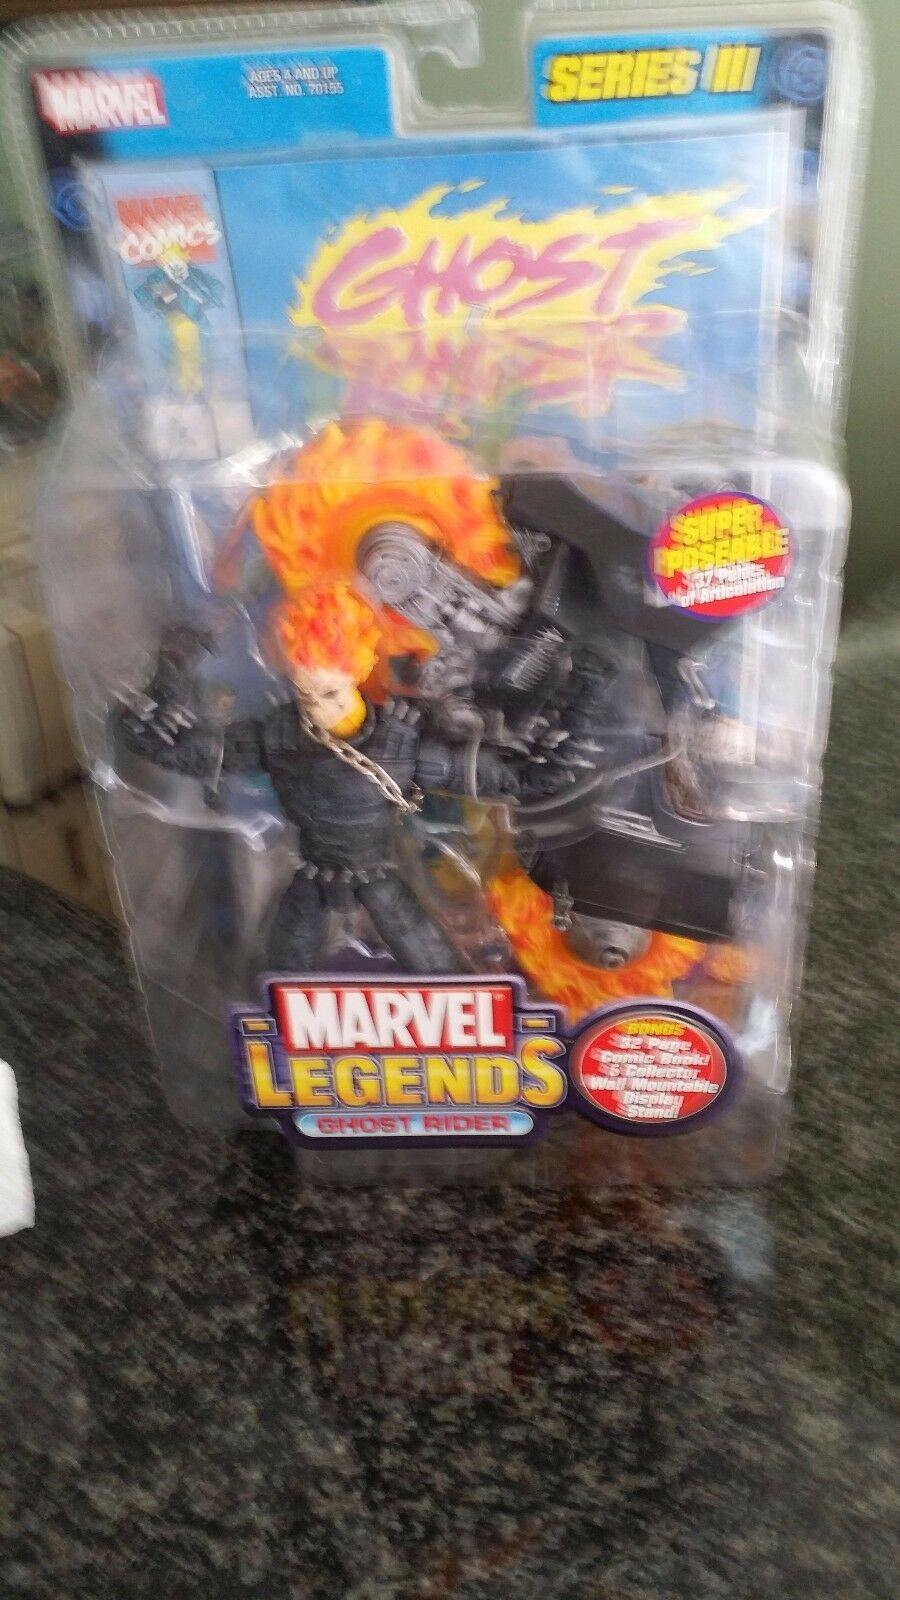 Marvel - legenden ghost rider - serie iii. bonus 32 seiten comic & wall mount st.